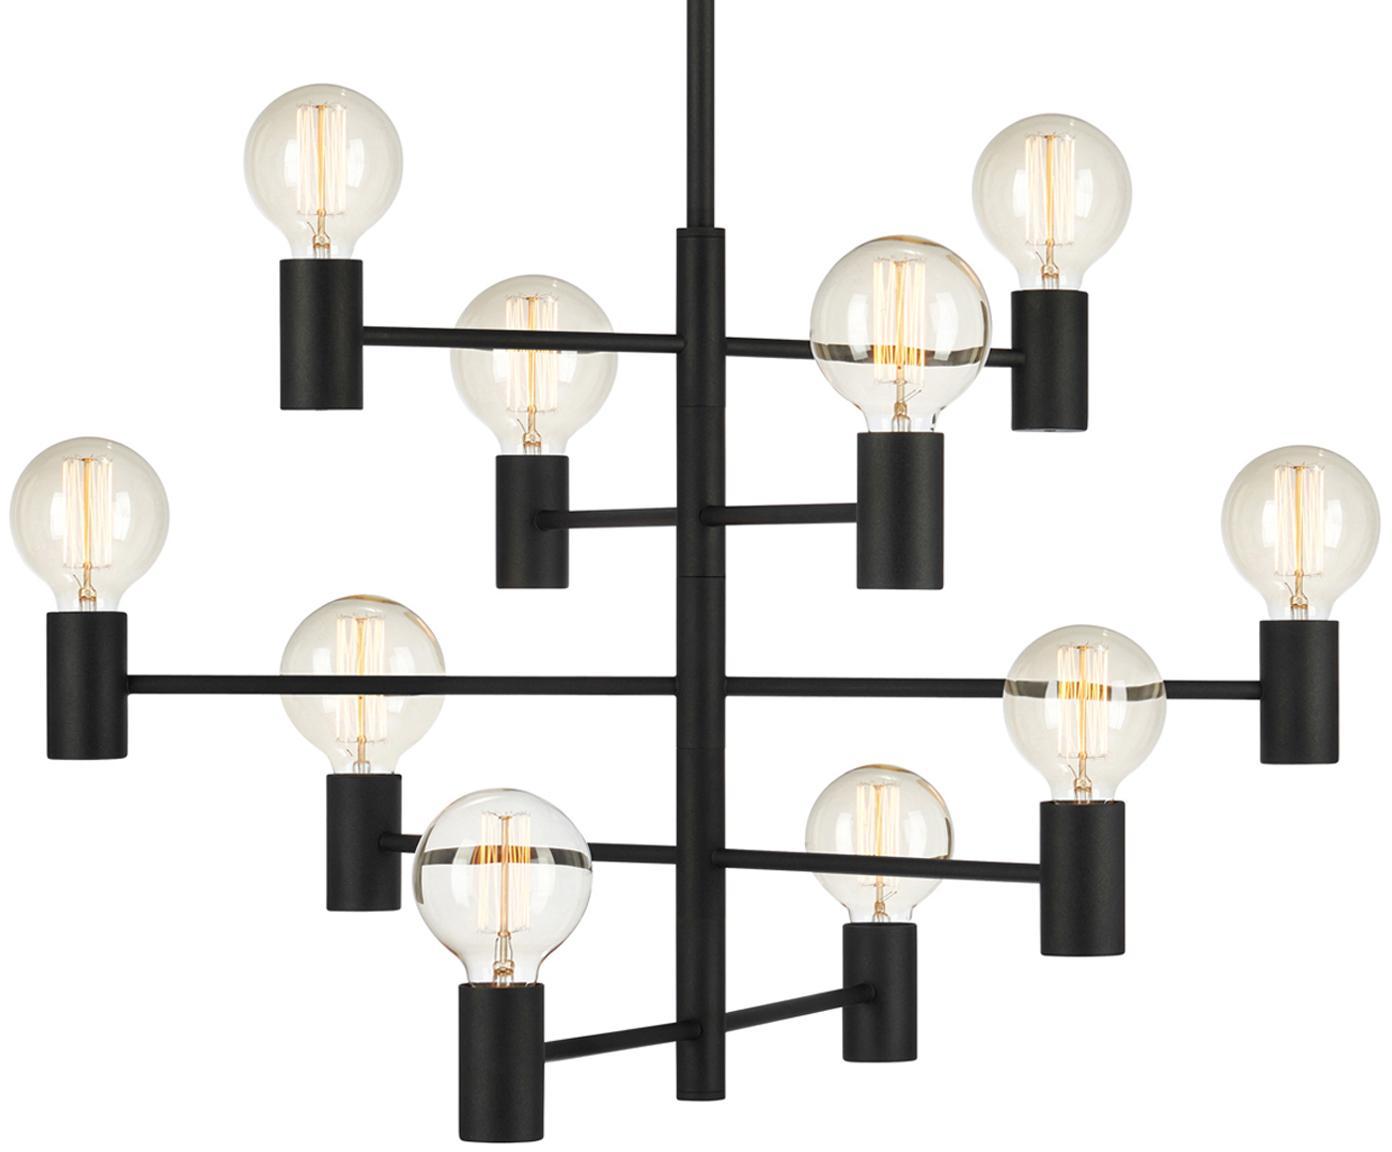 Hanglamp Paris, verstelbaar, Gelakt messing, Lamp: zwart. Snoer: transparant, Ø 80 x H 49 cm